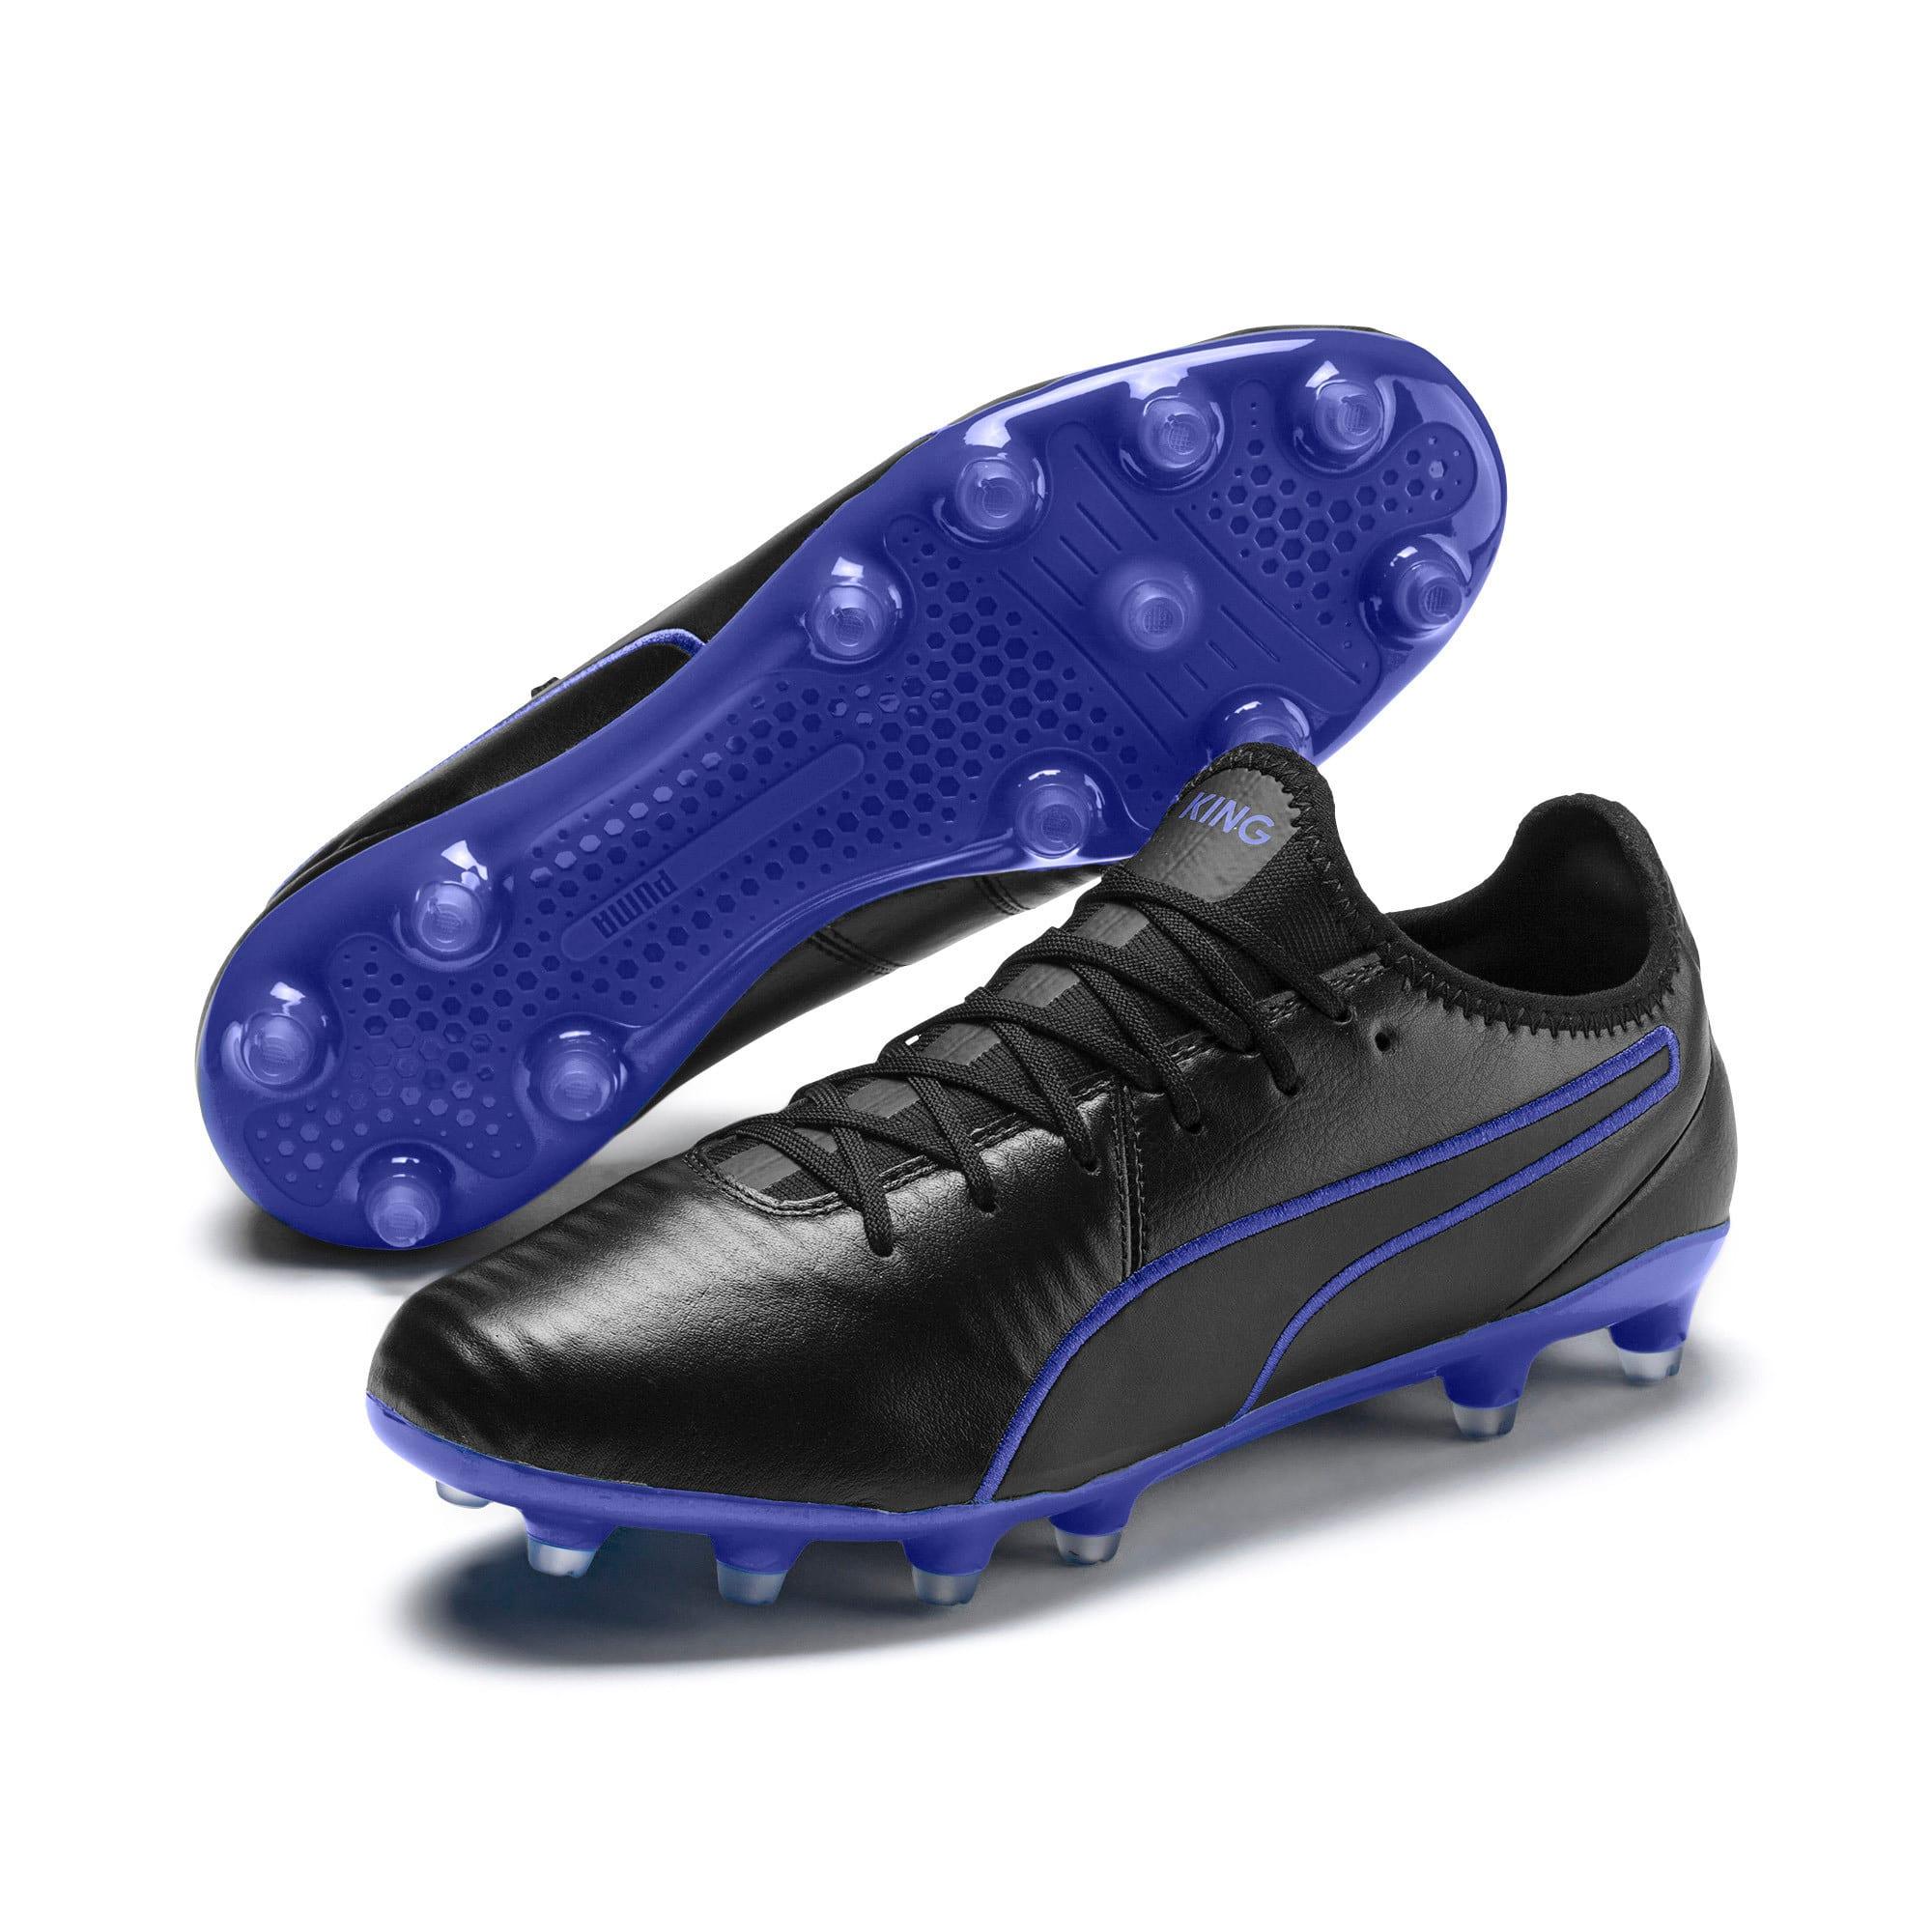 Thumbnail 2 of King Pro FG Soccer Cleats, Puma Black-Royal Blue, medium